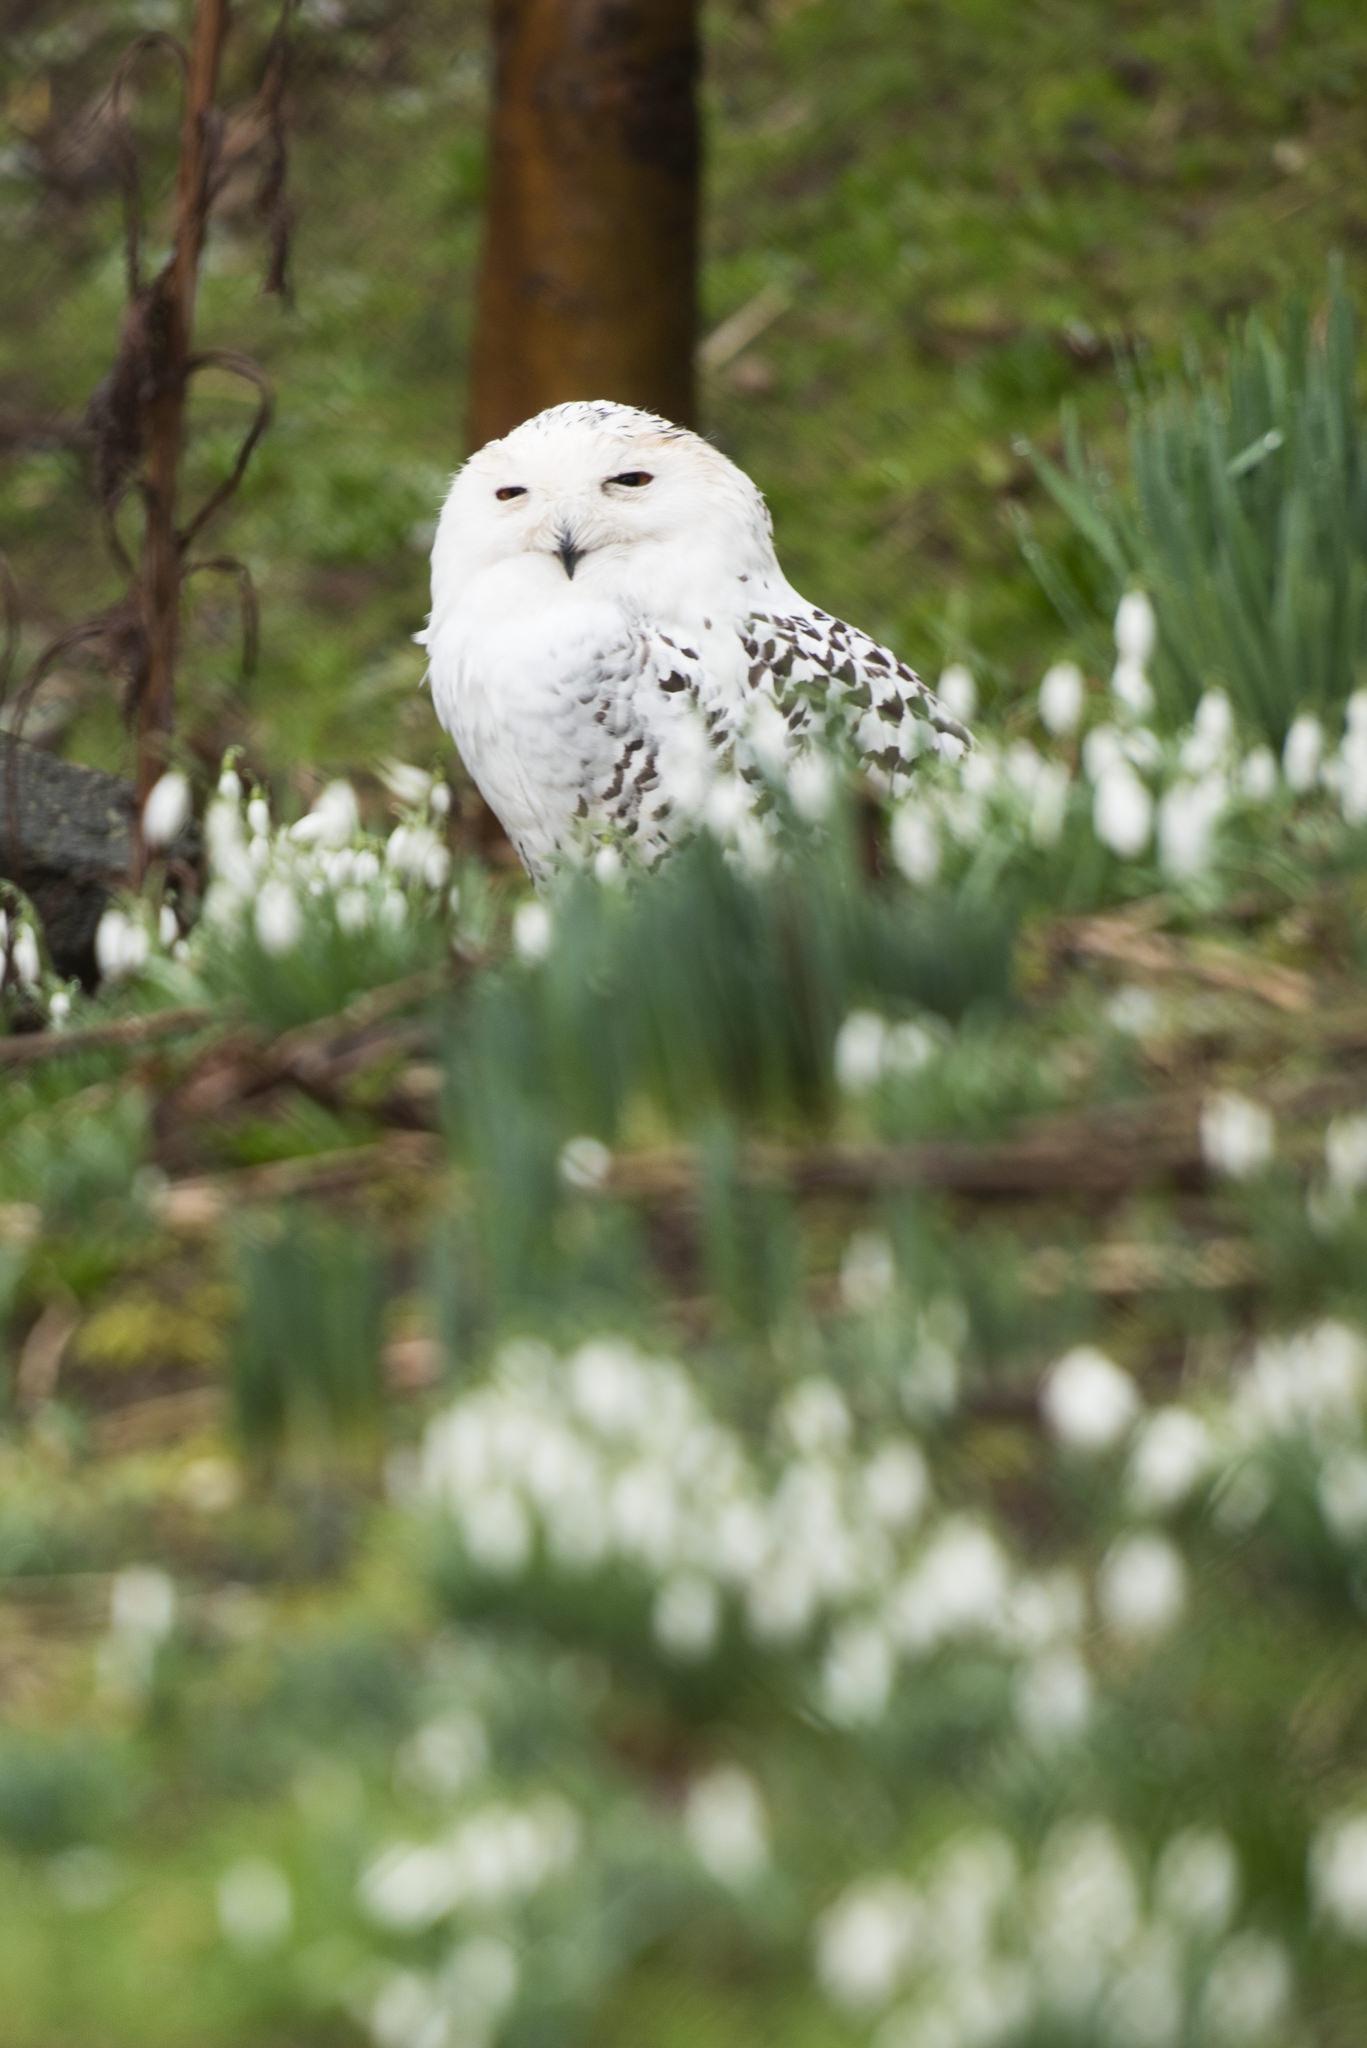 snowy-owl-edinburgh-zoo-3054-web.jpg